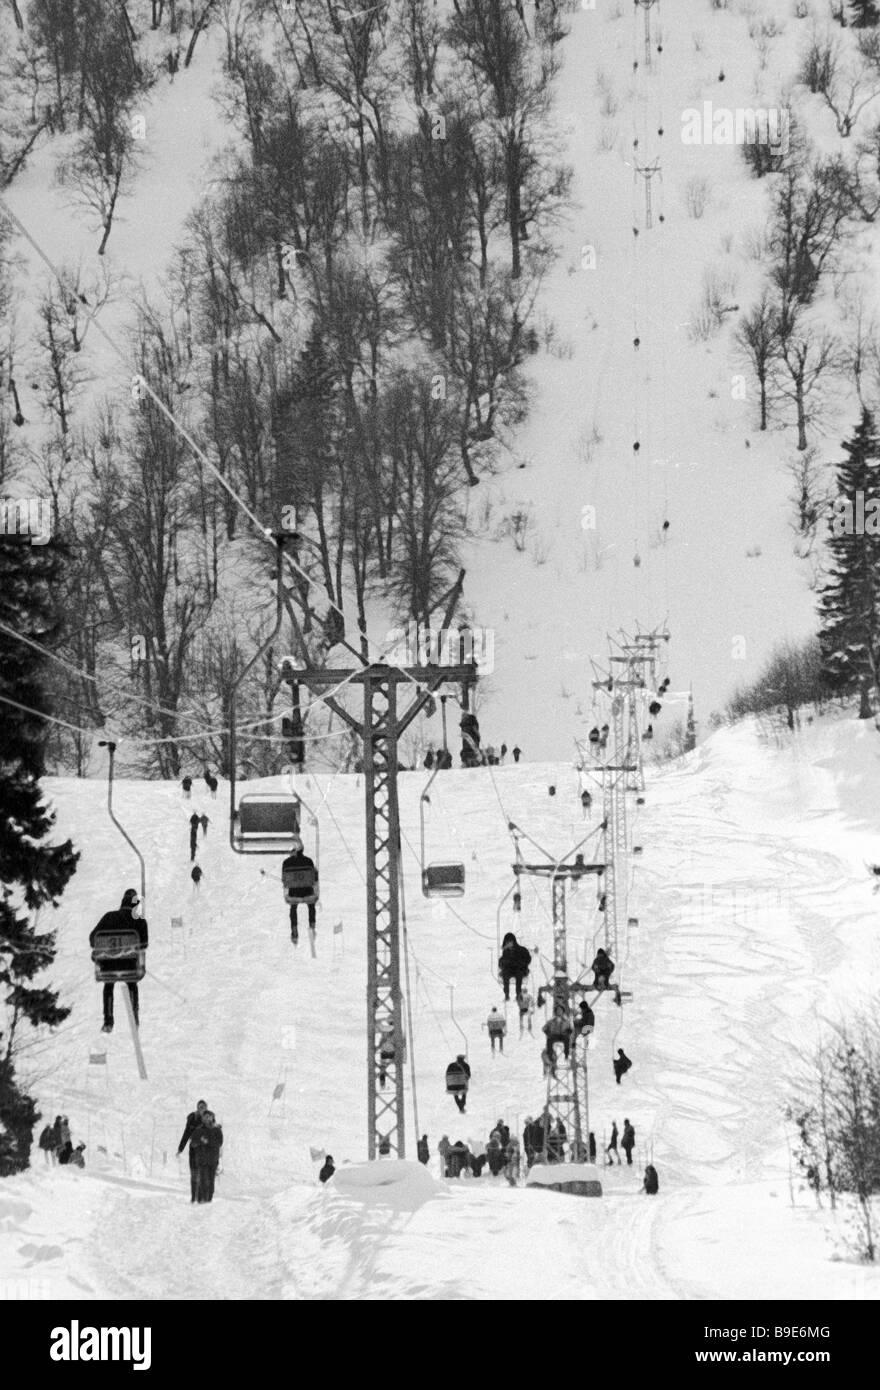 Ski lift It lifts 300 people per hour at a height 2 000 km Bakuriani settlement - Stock Image